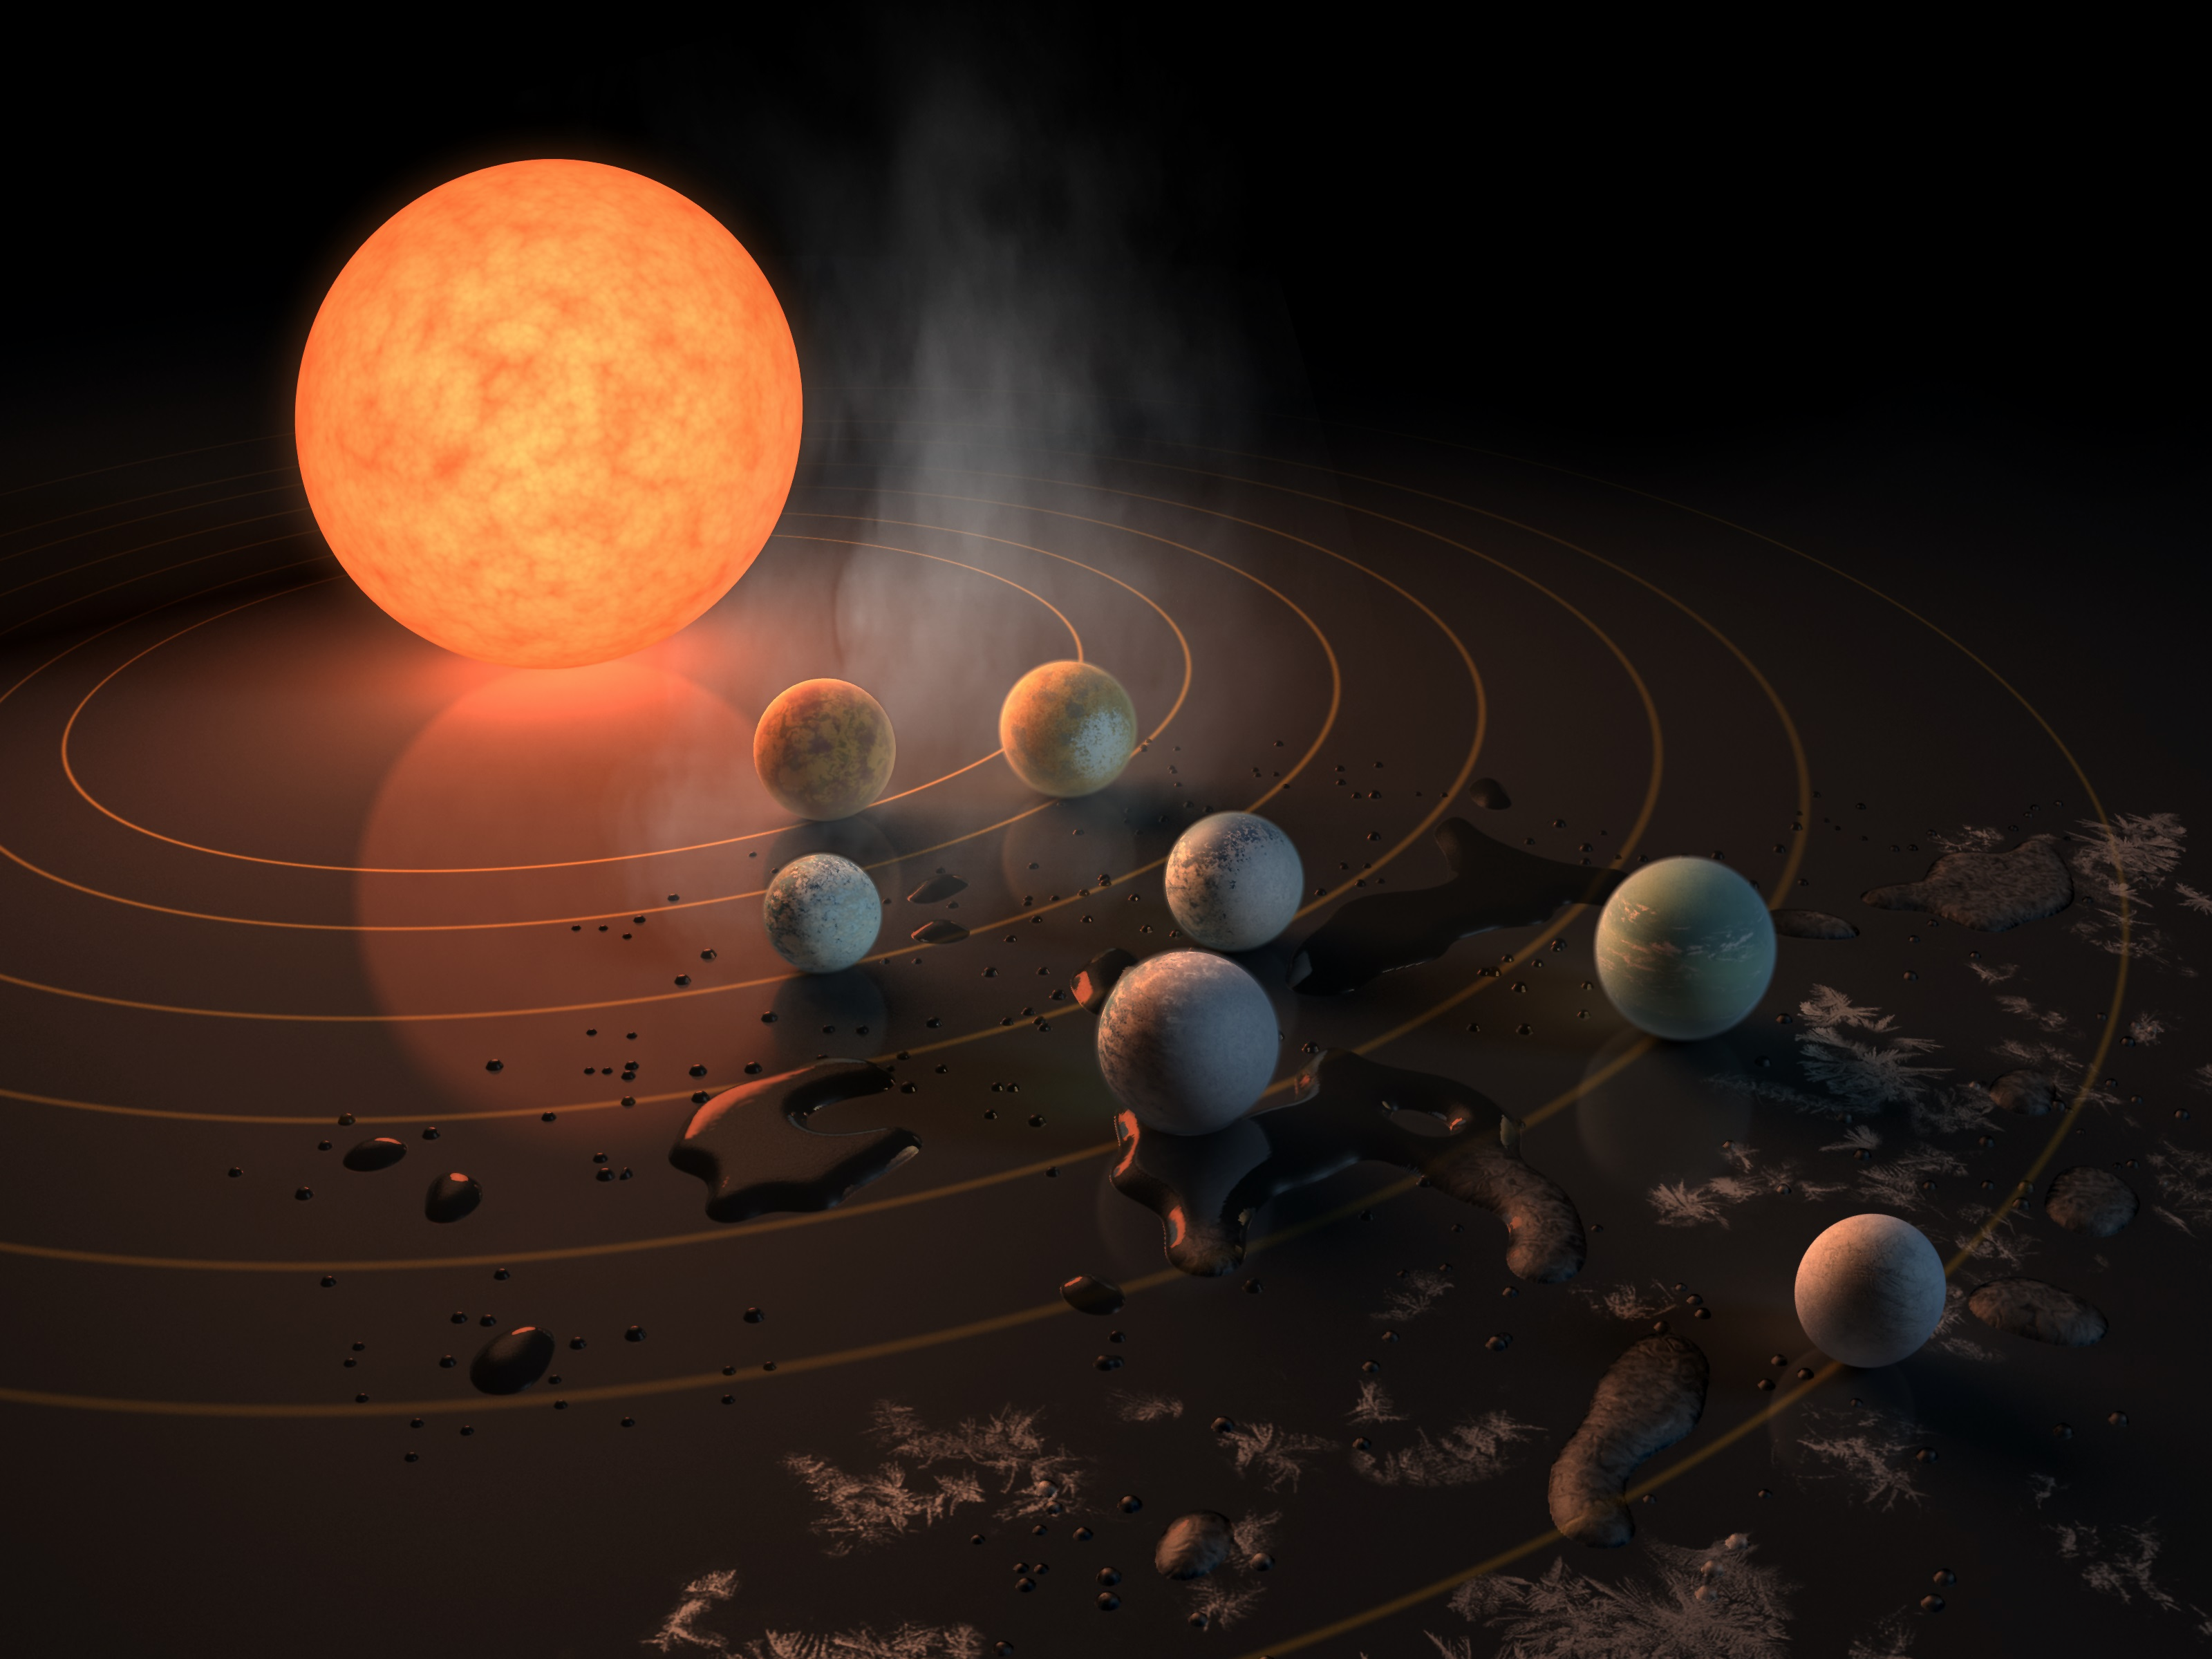 nasa planetary data system - HD3200×2400